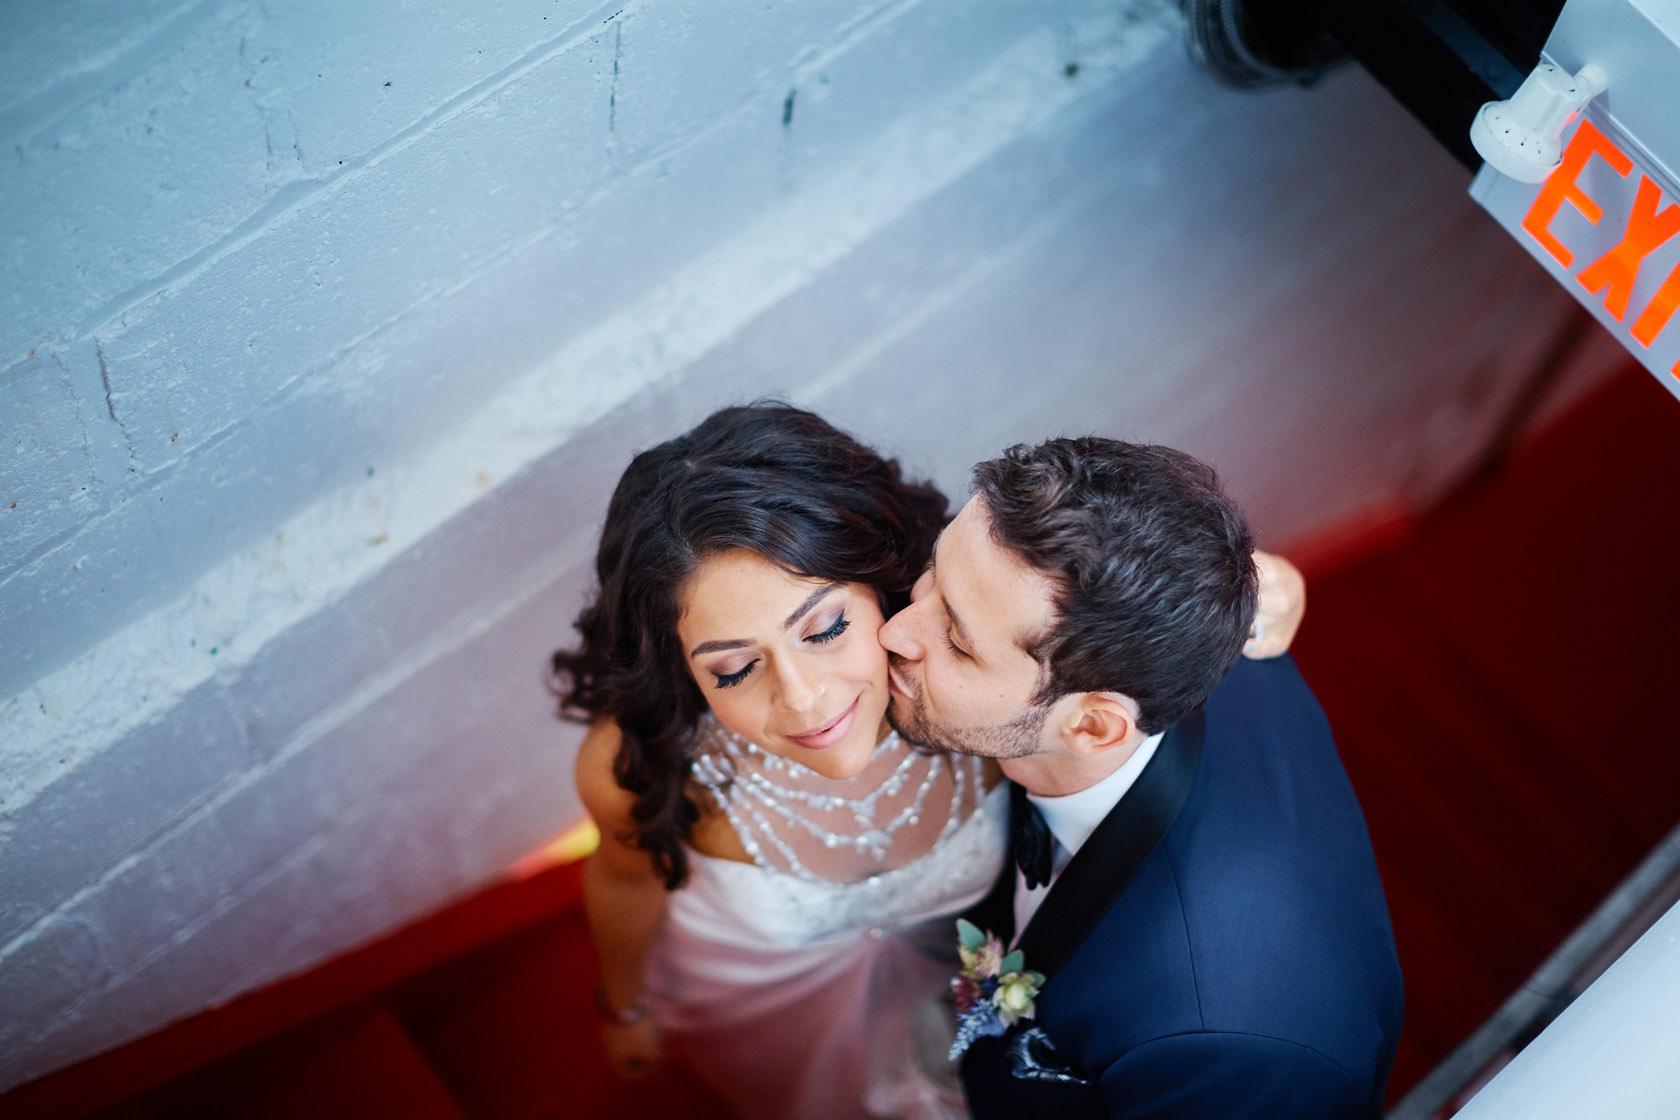 stephen sager photography 2192 toronto wedding photography